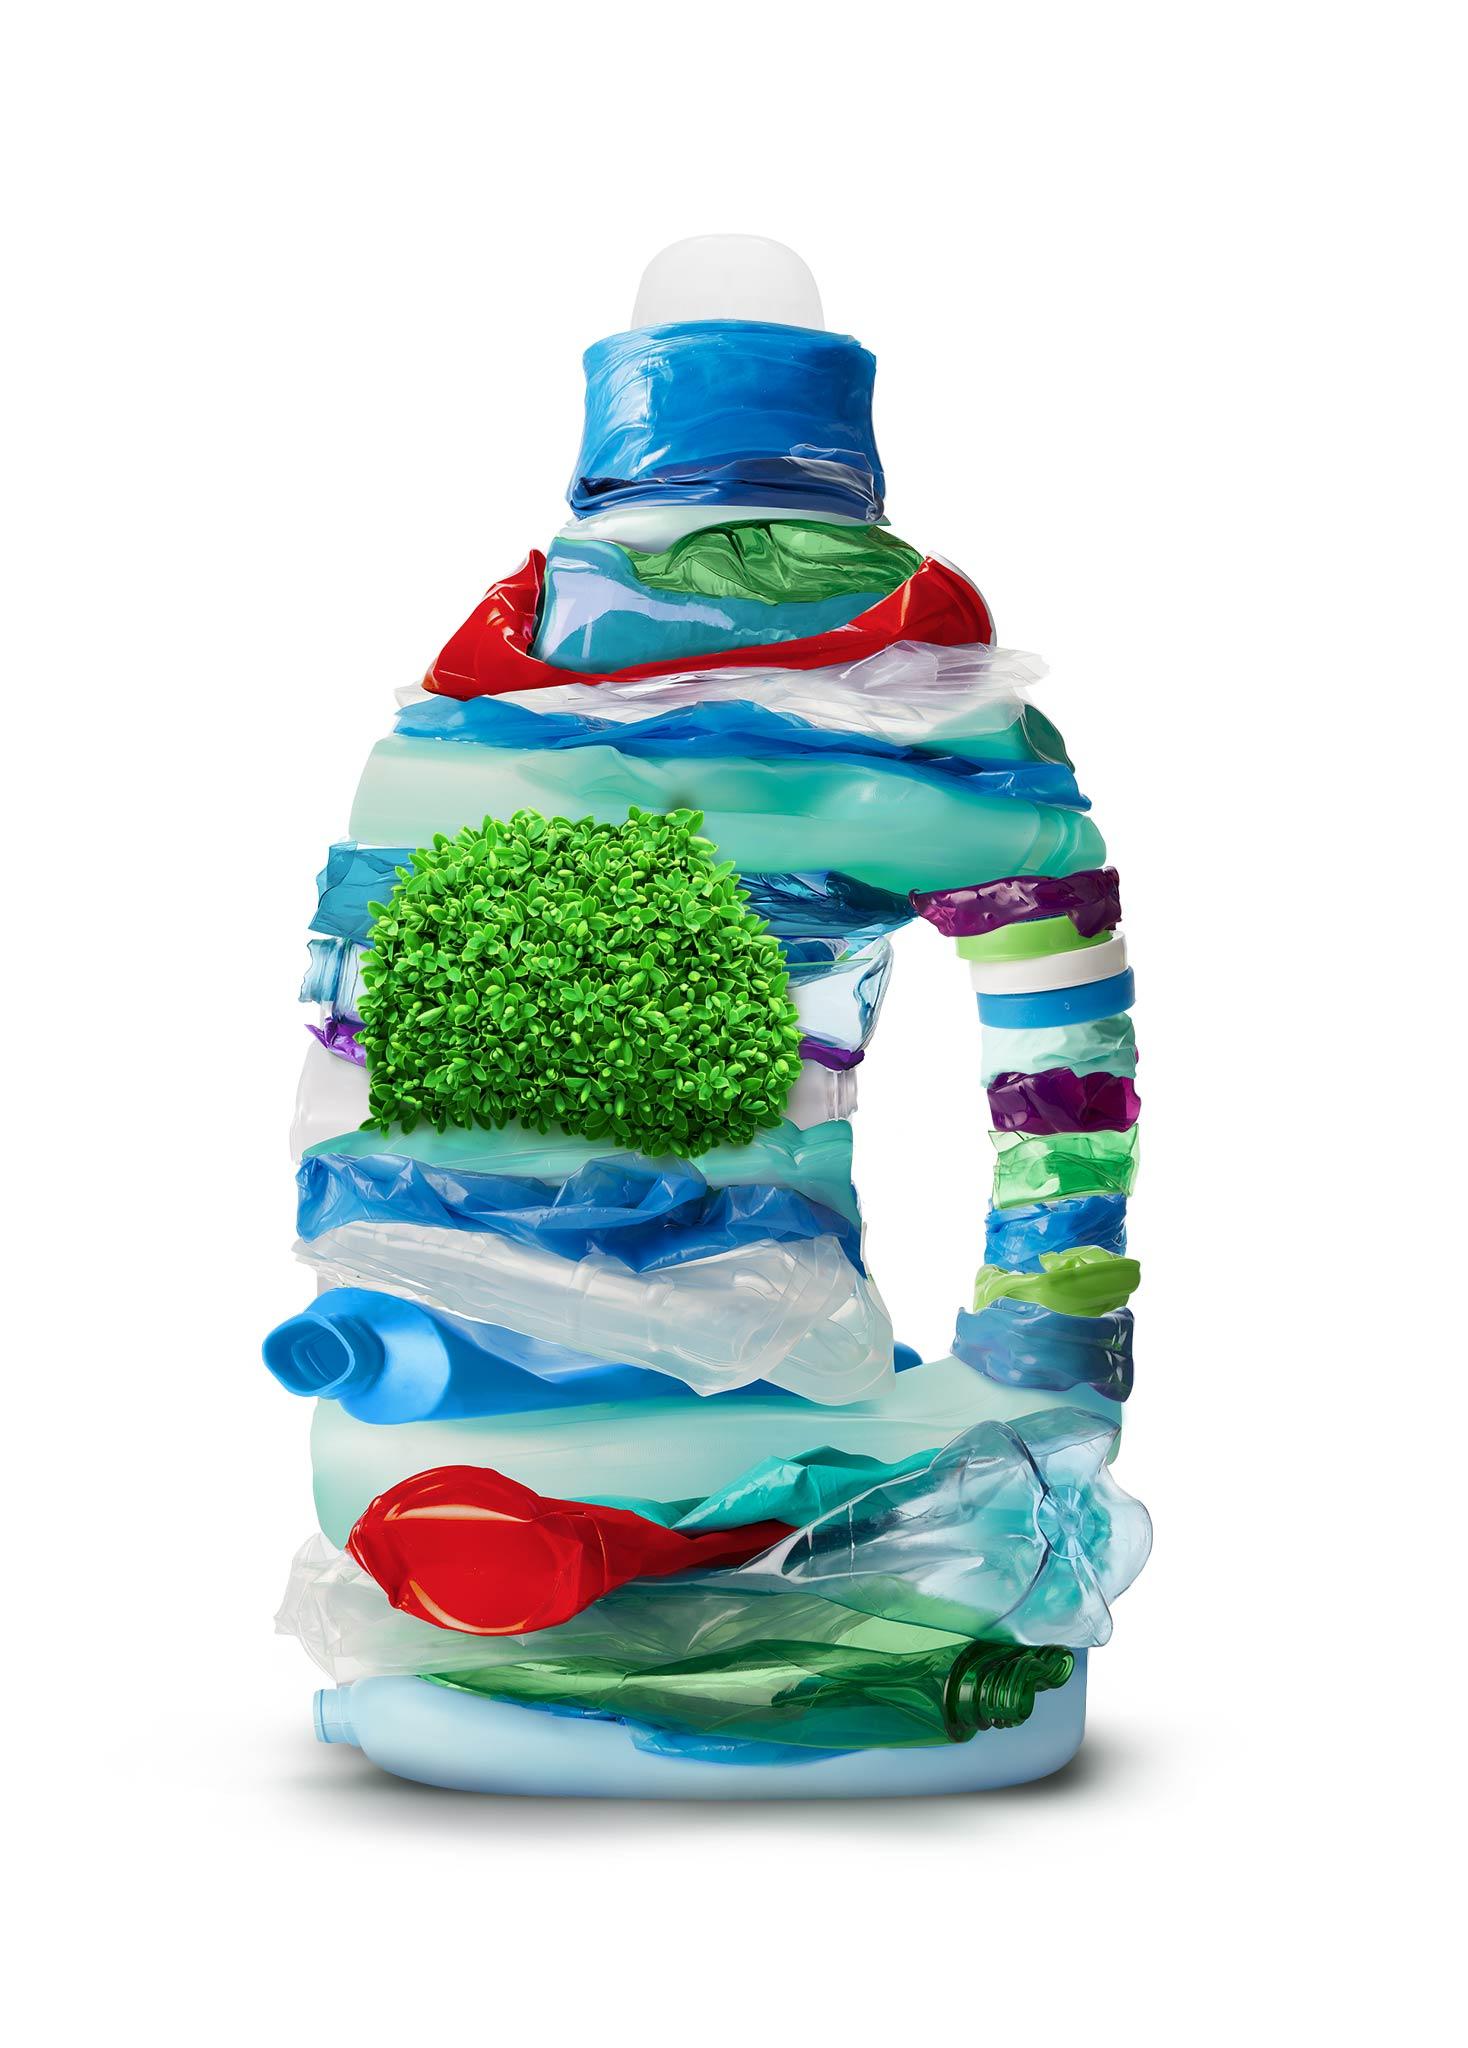 EURO-Laundry_Recycling_09.jpg